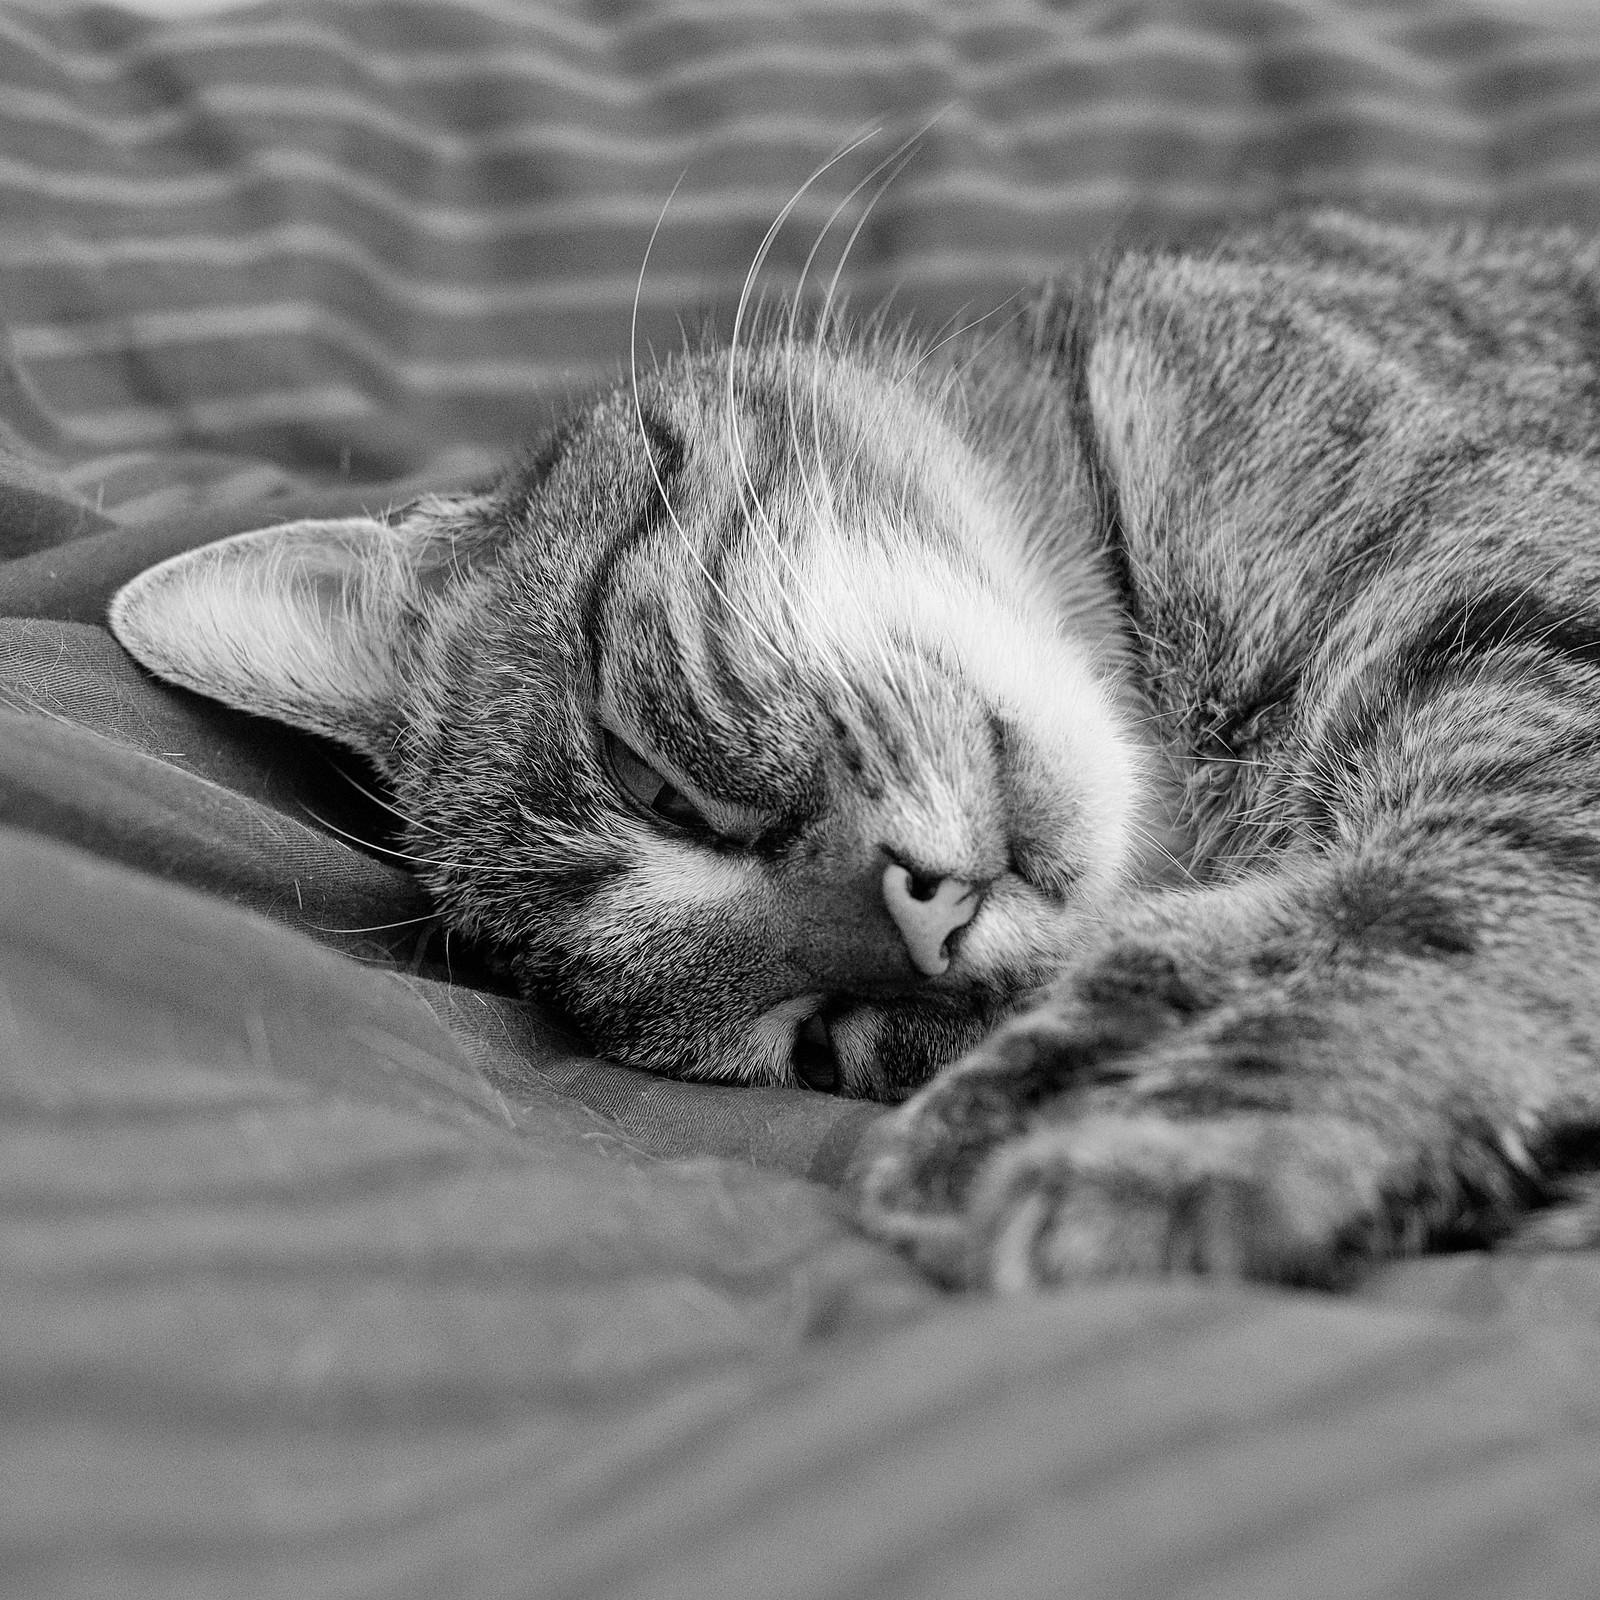 7e2_8051104-sfx-019-sleepy-cat